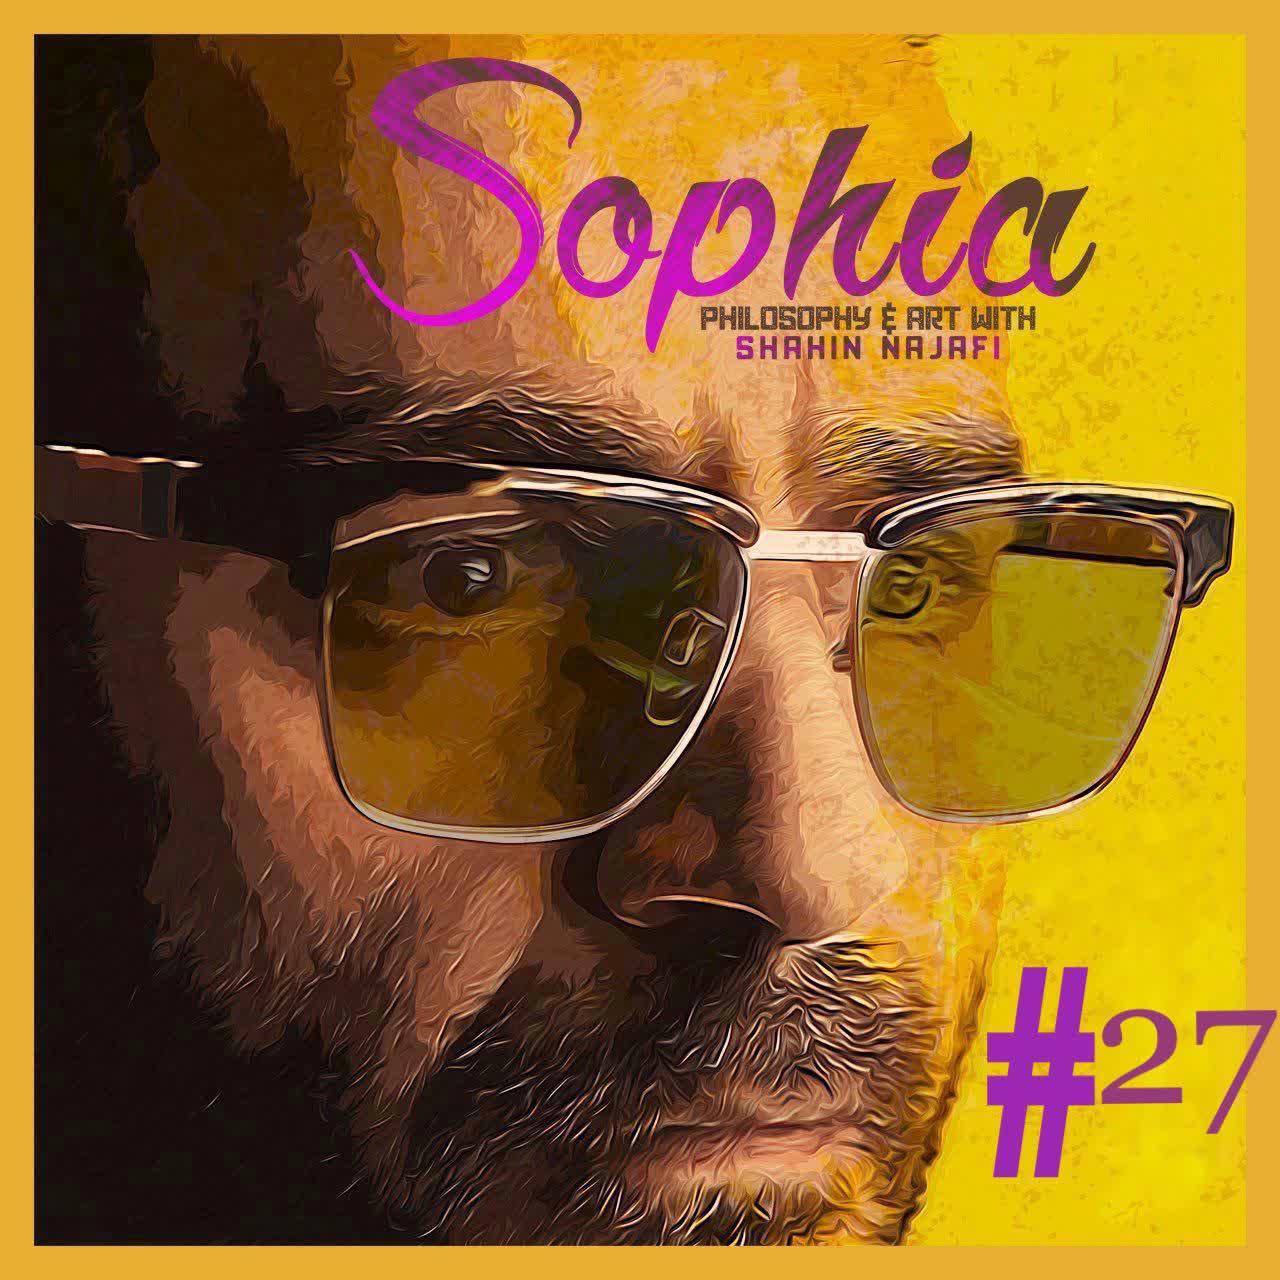 Sophia #27 Aristotle 4- Shahin Najafi & Veria Amiri سوفیا ۲۷ - ارسطو ۴ - شاهین نجفی و وریا امیری